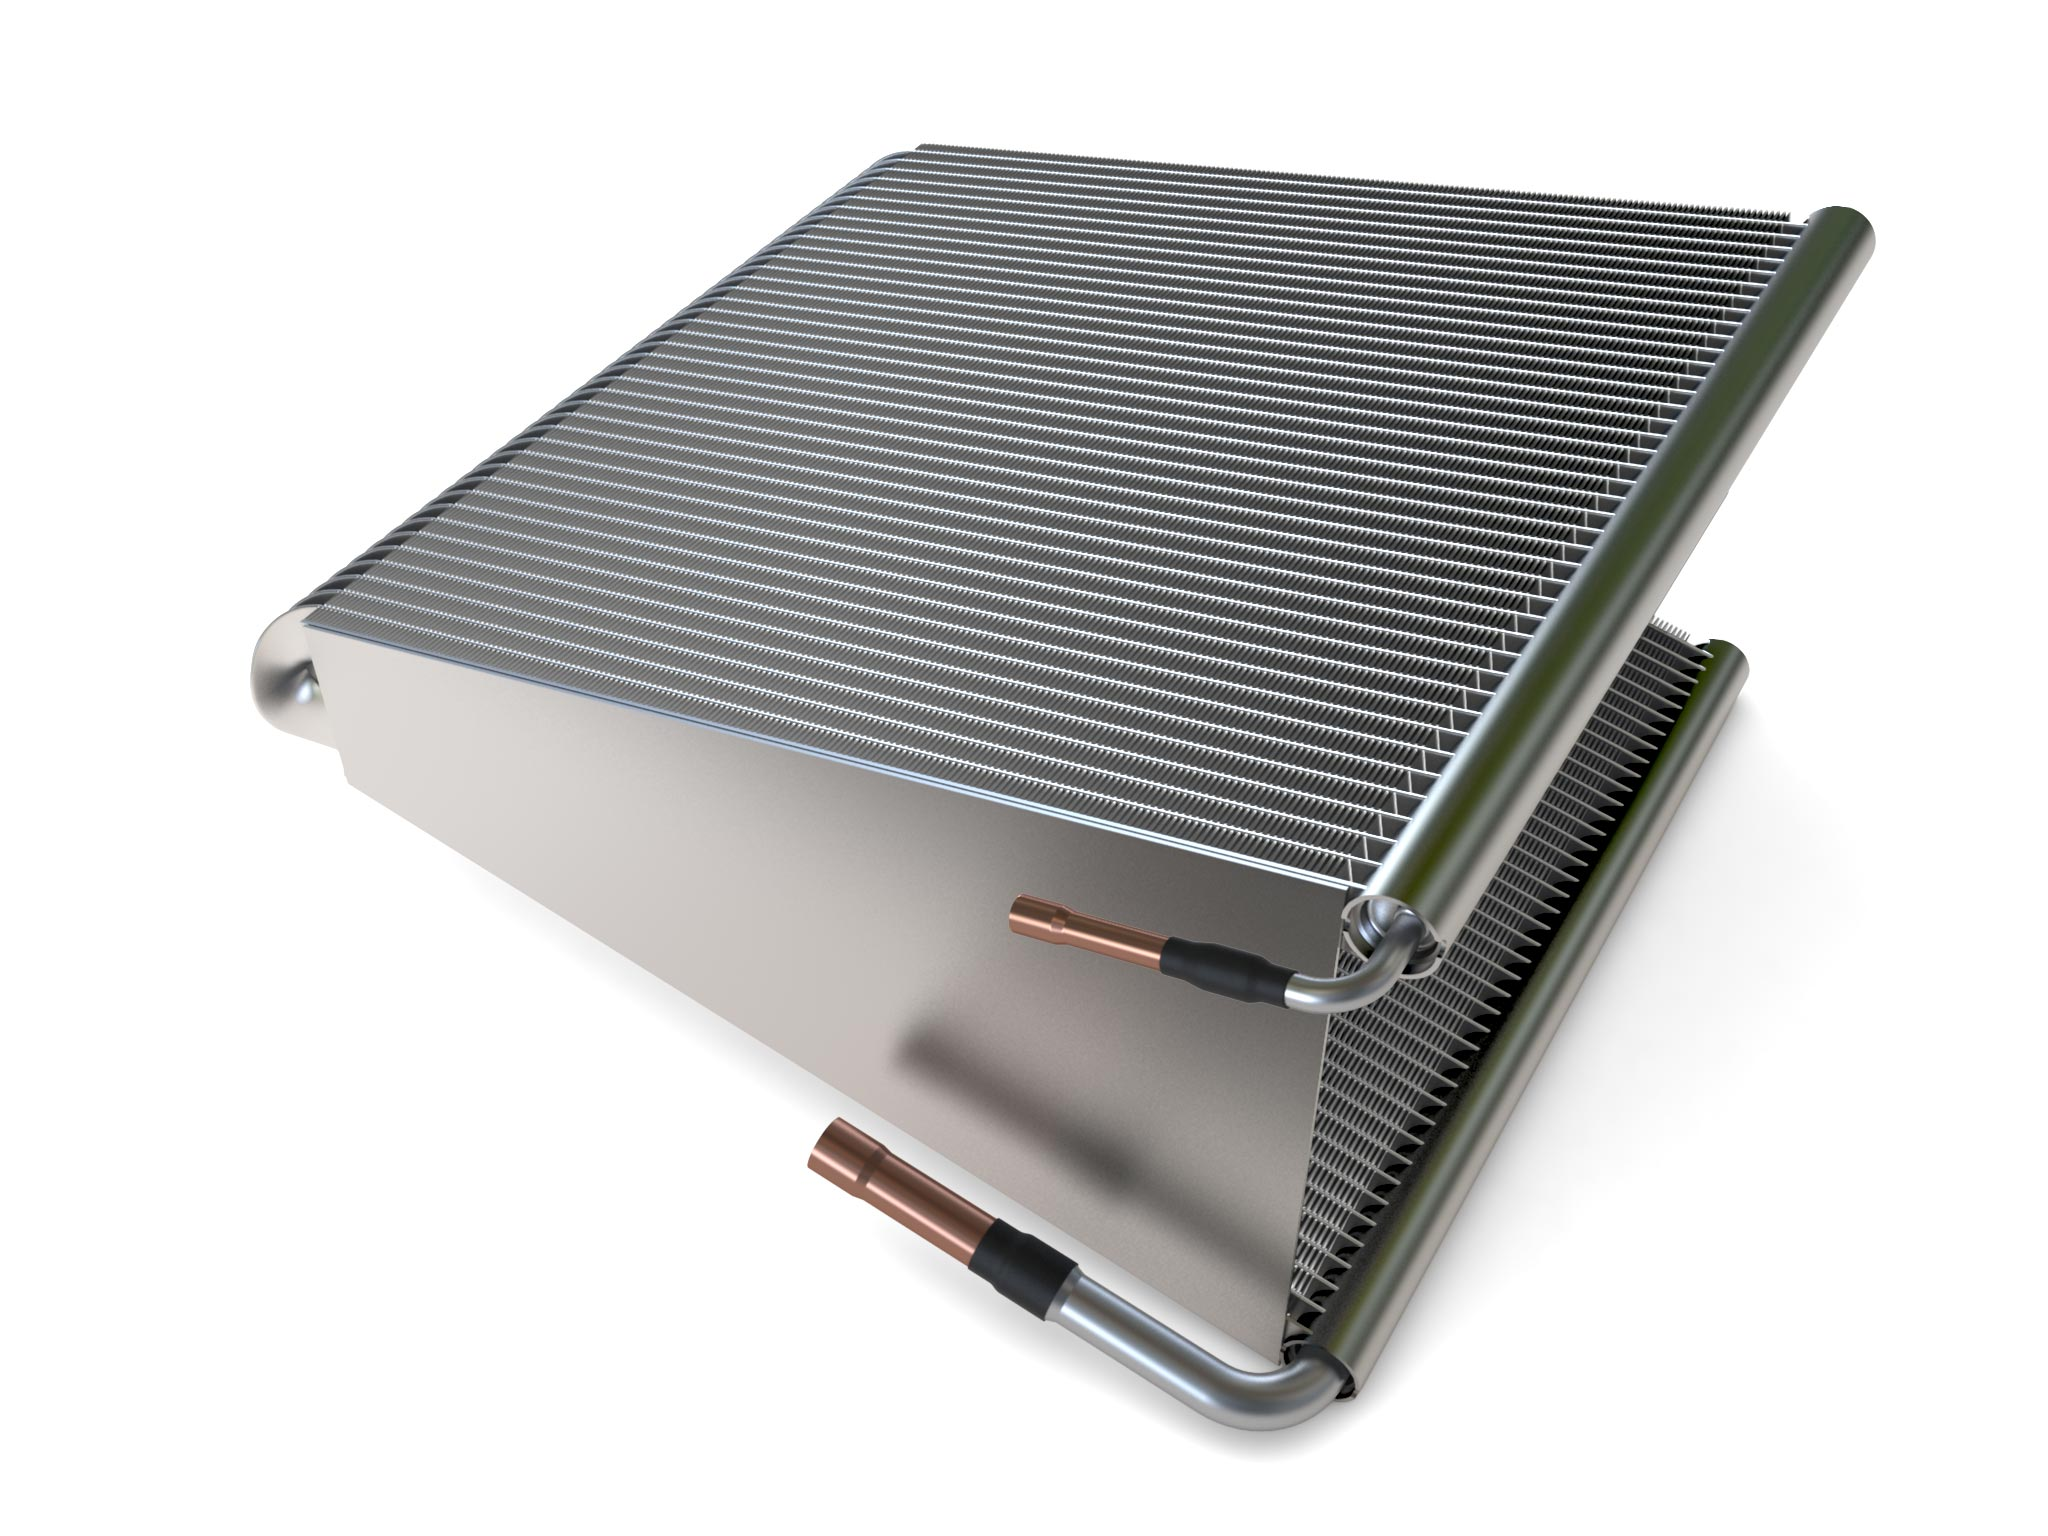 API AirTech MicroChannelEvap